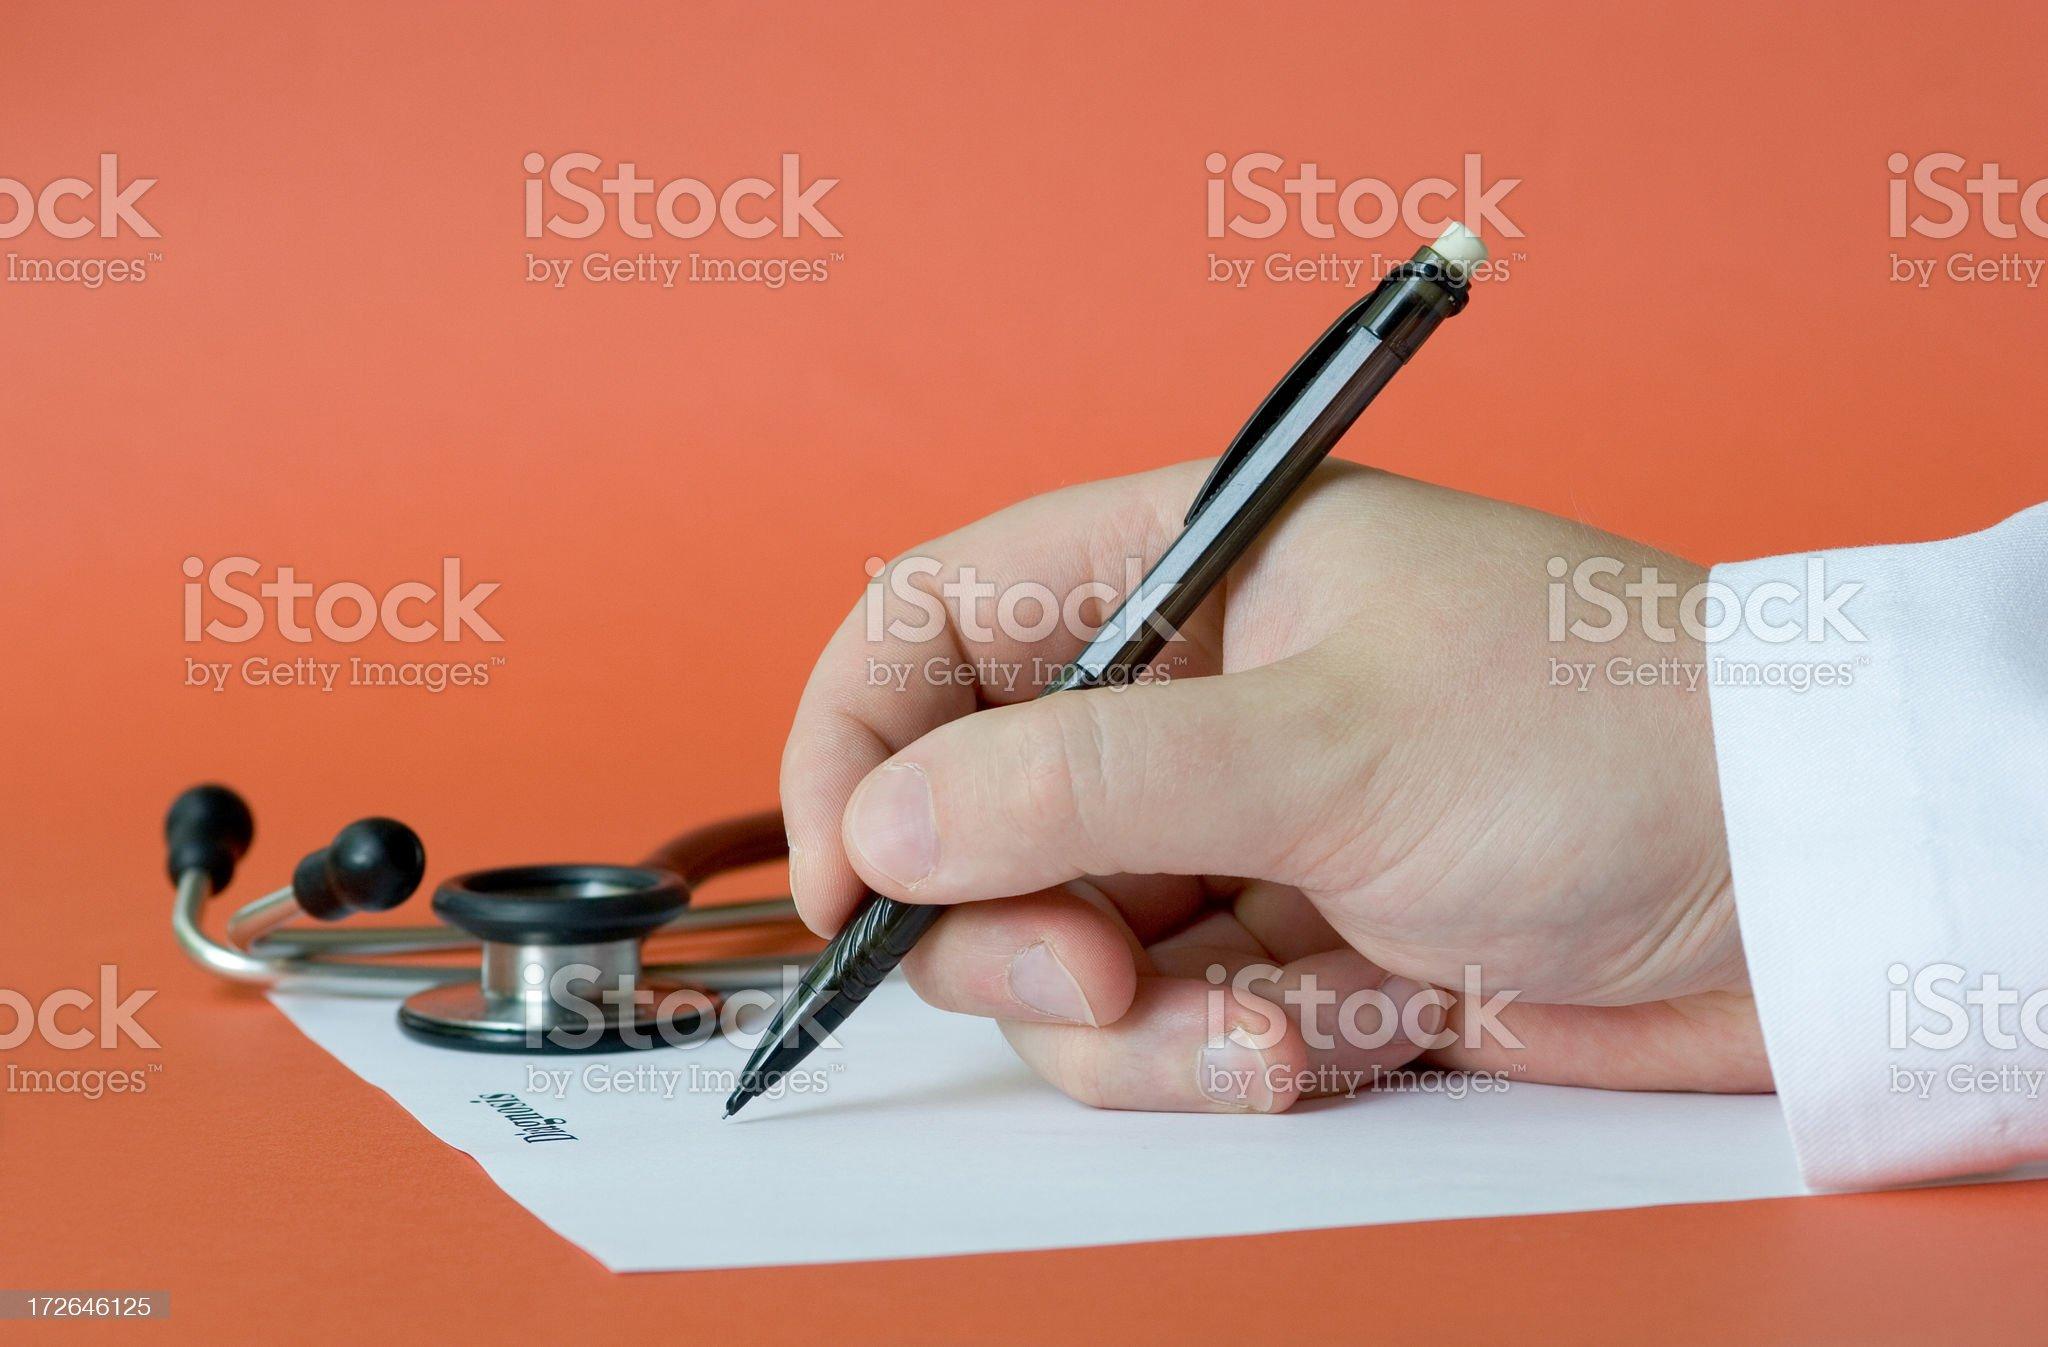 Diagnosis royalty-free stock photo